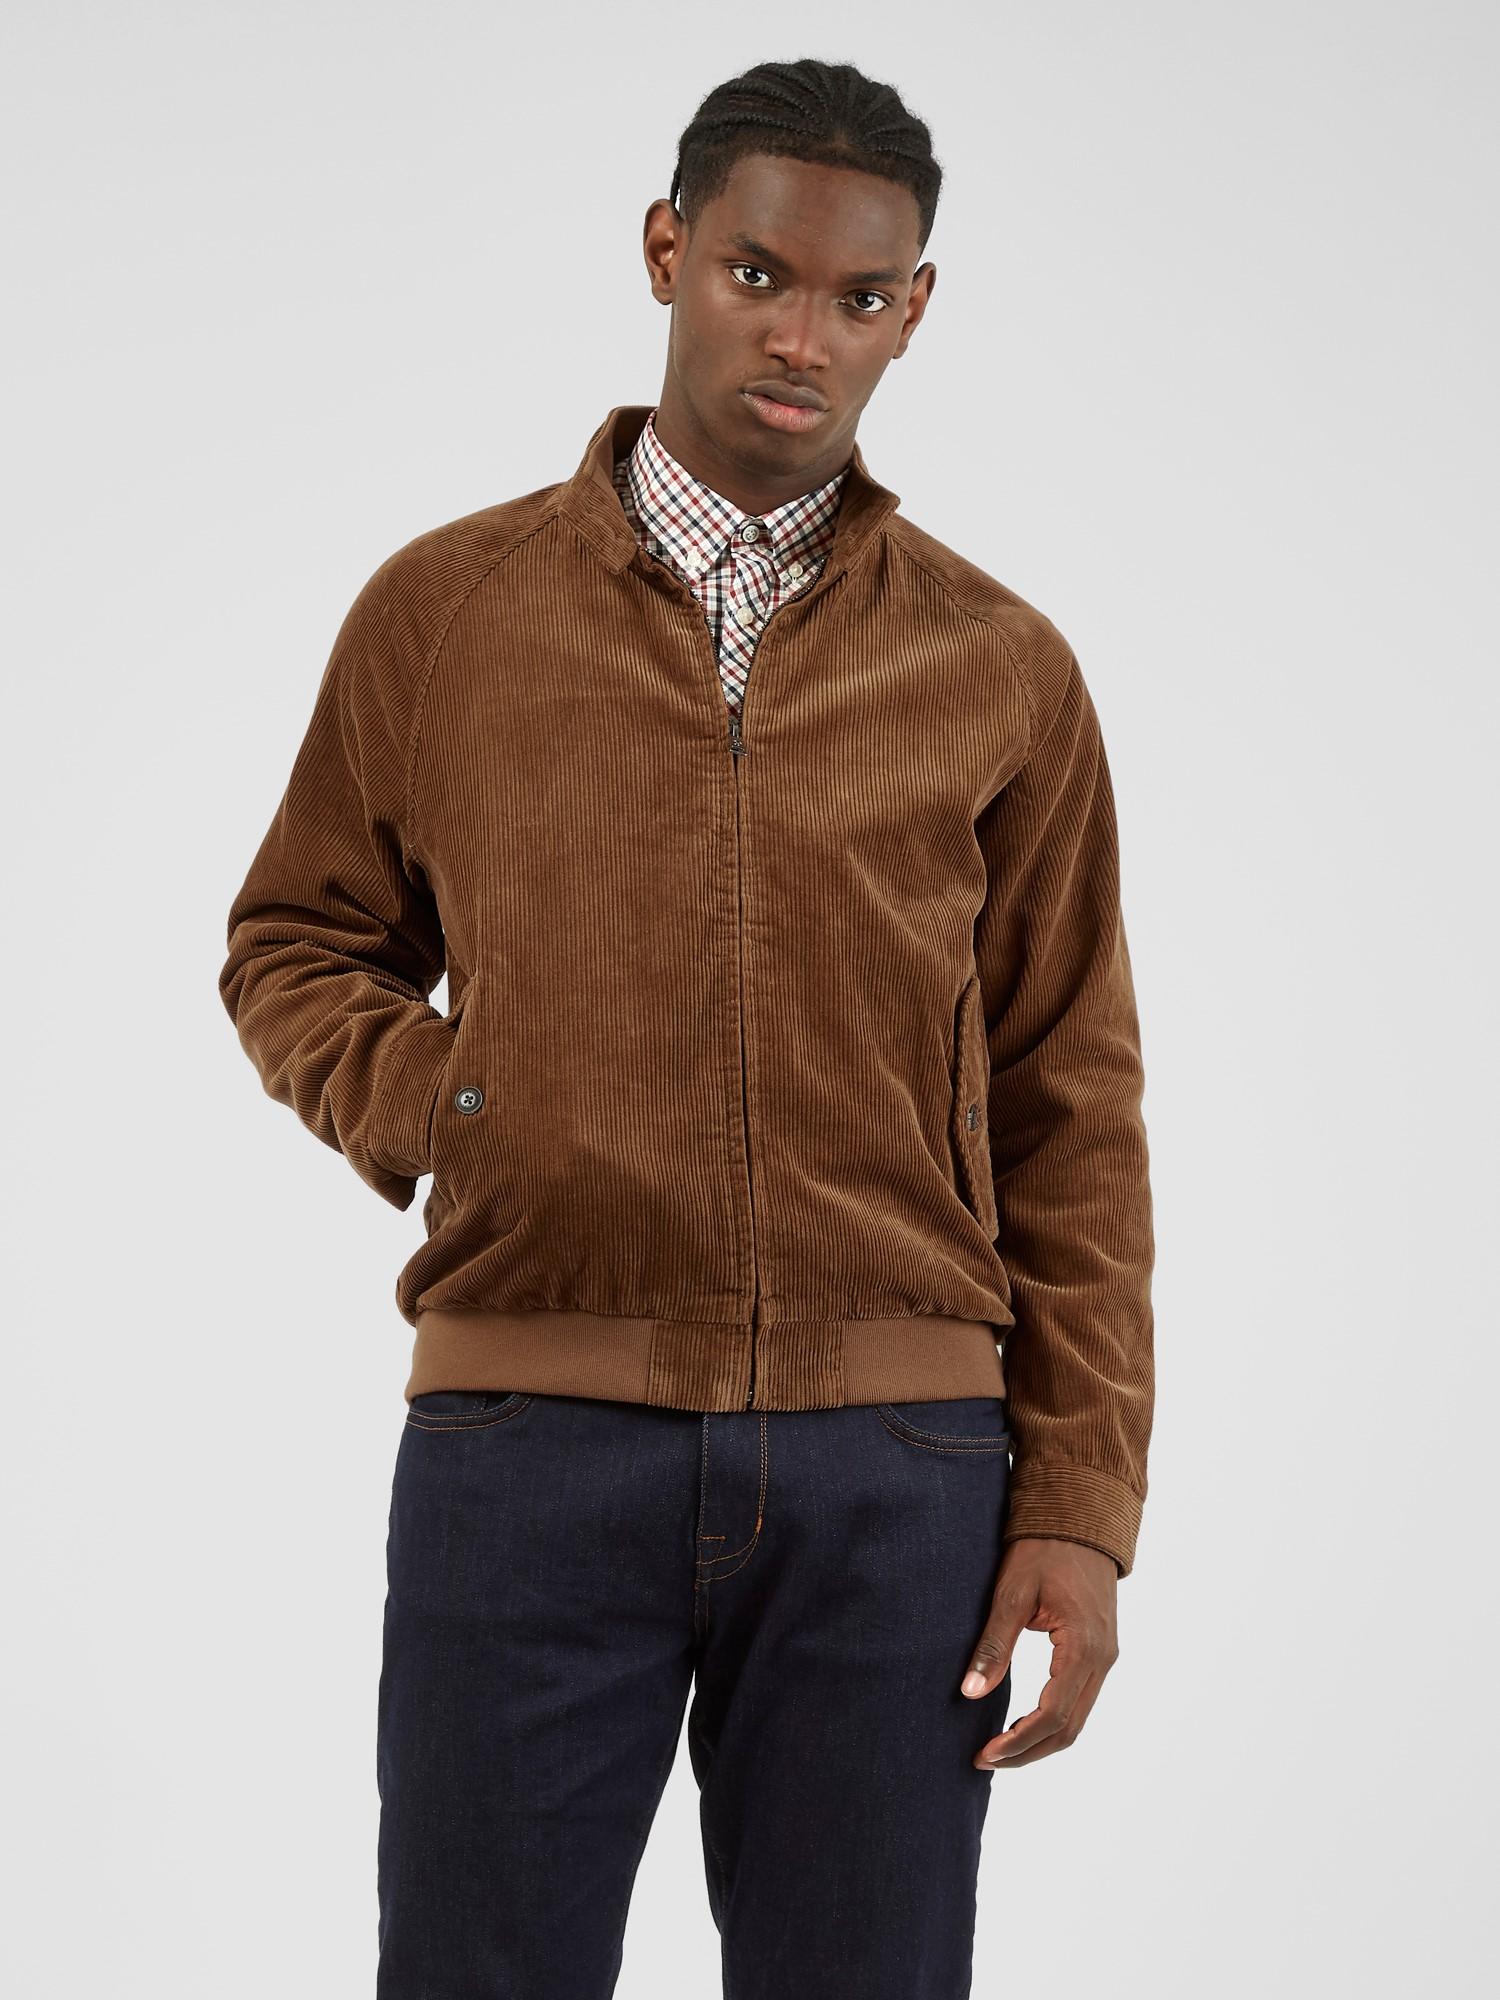 Tan Cord Harrington Jacket